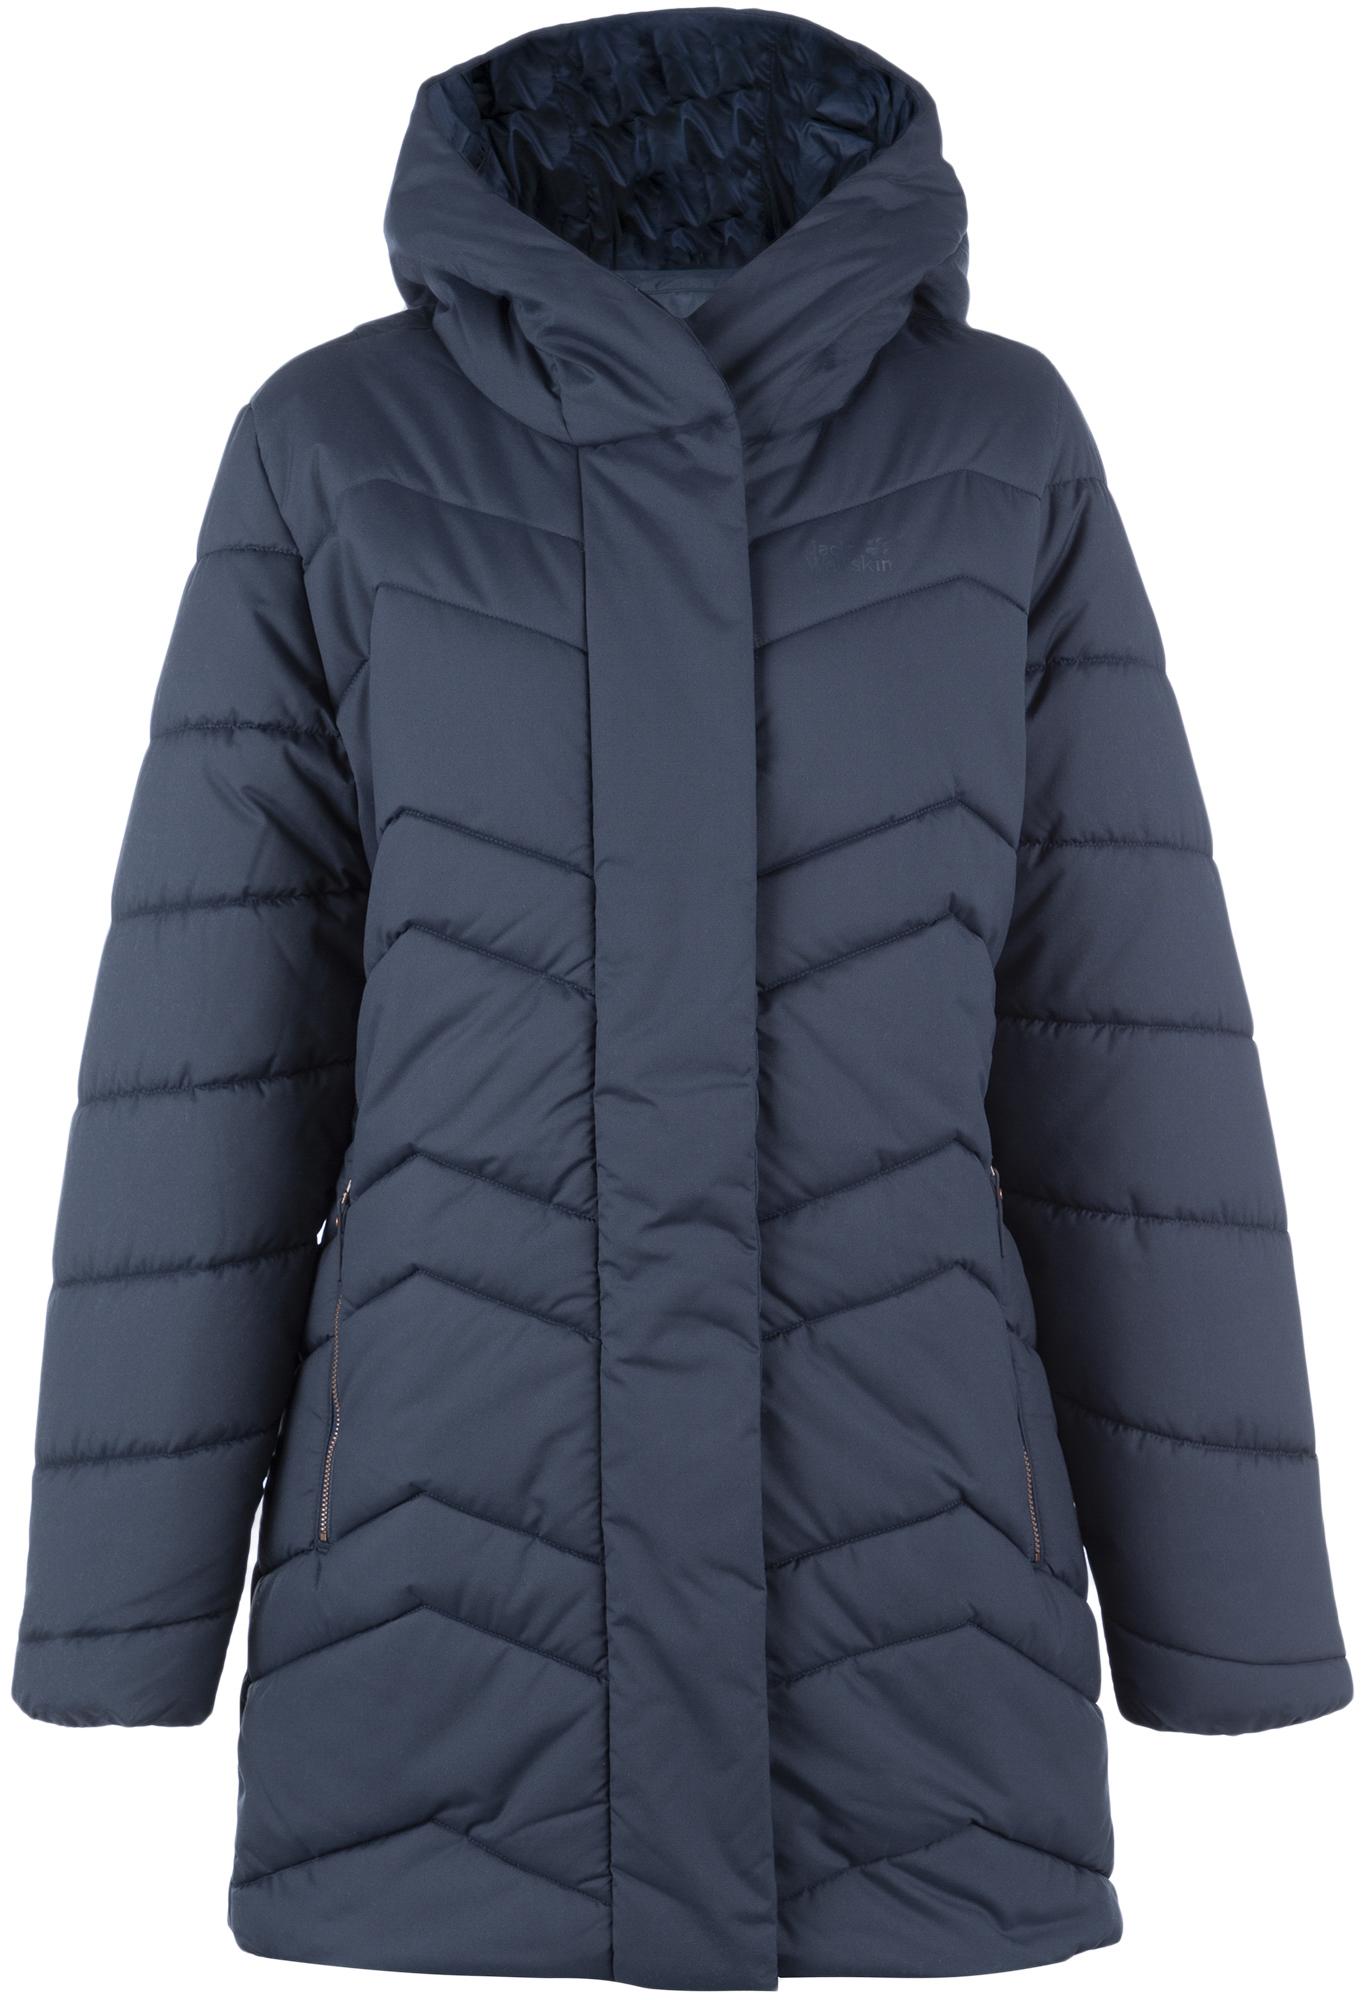 Jack Wolfskin Куртка утепленная женская Kyoto, размер 52-54